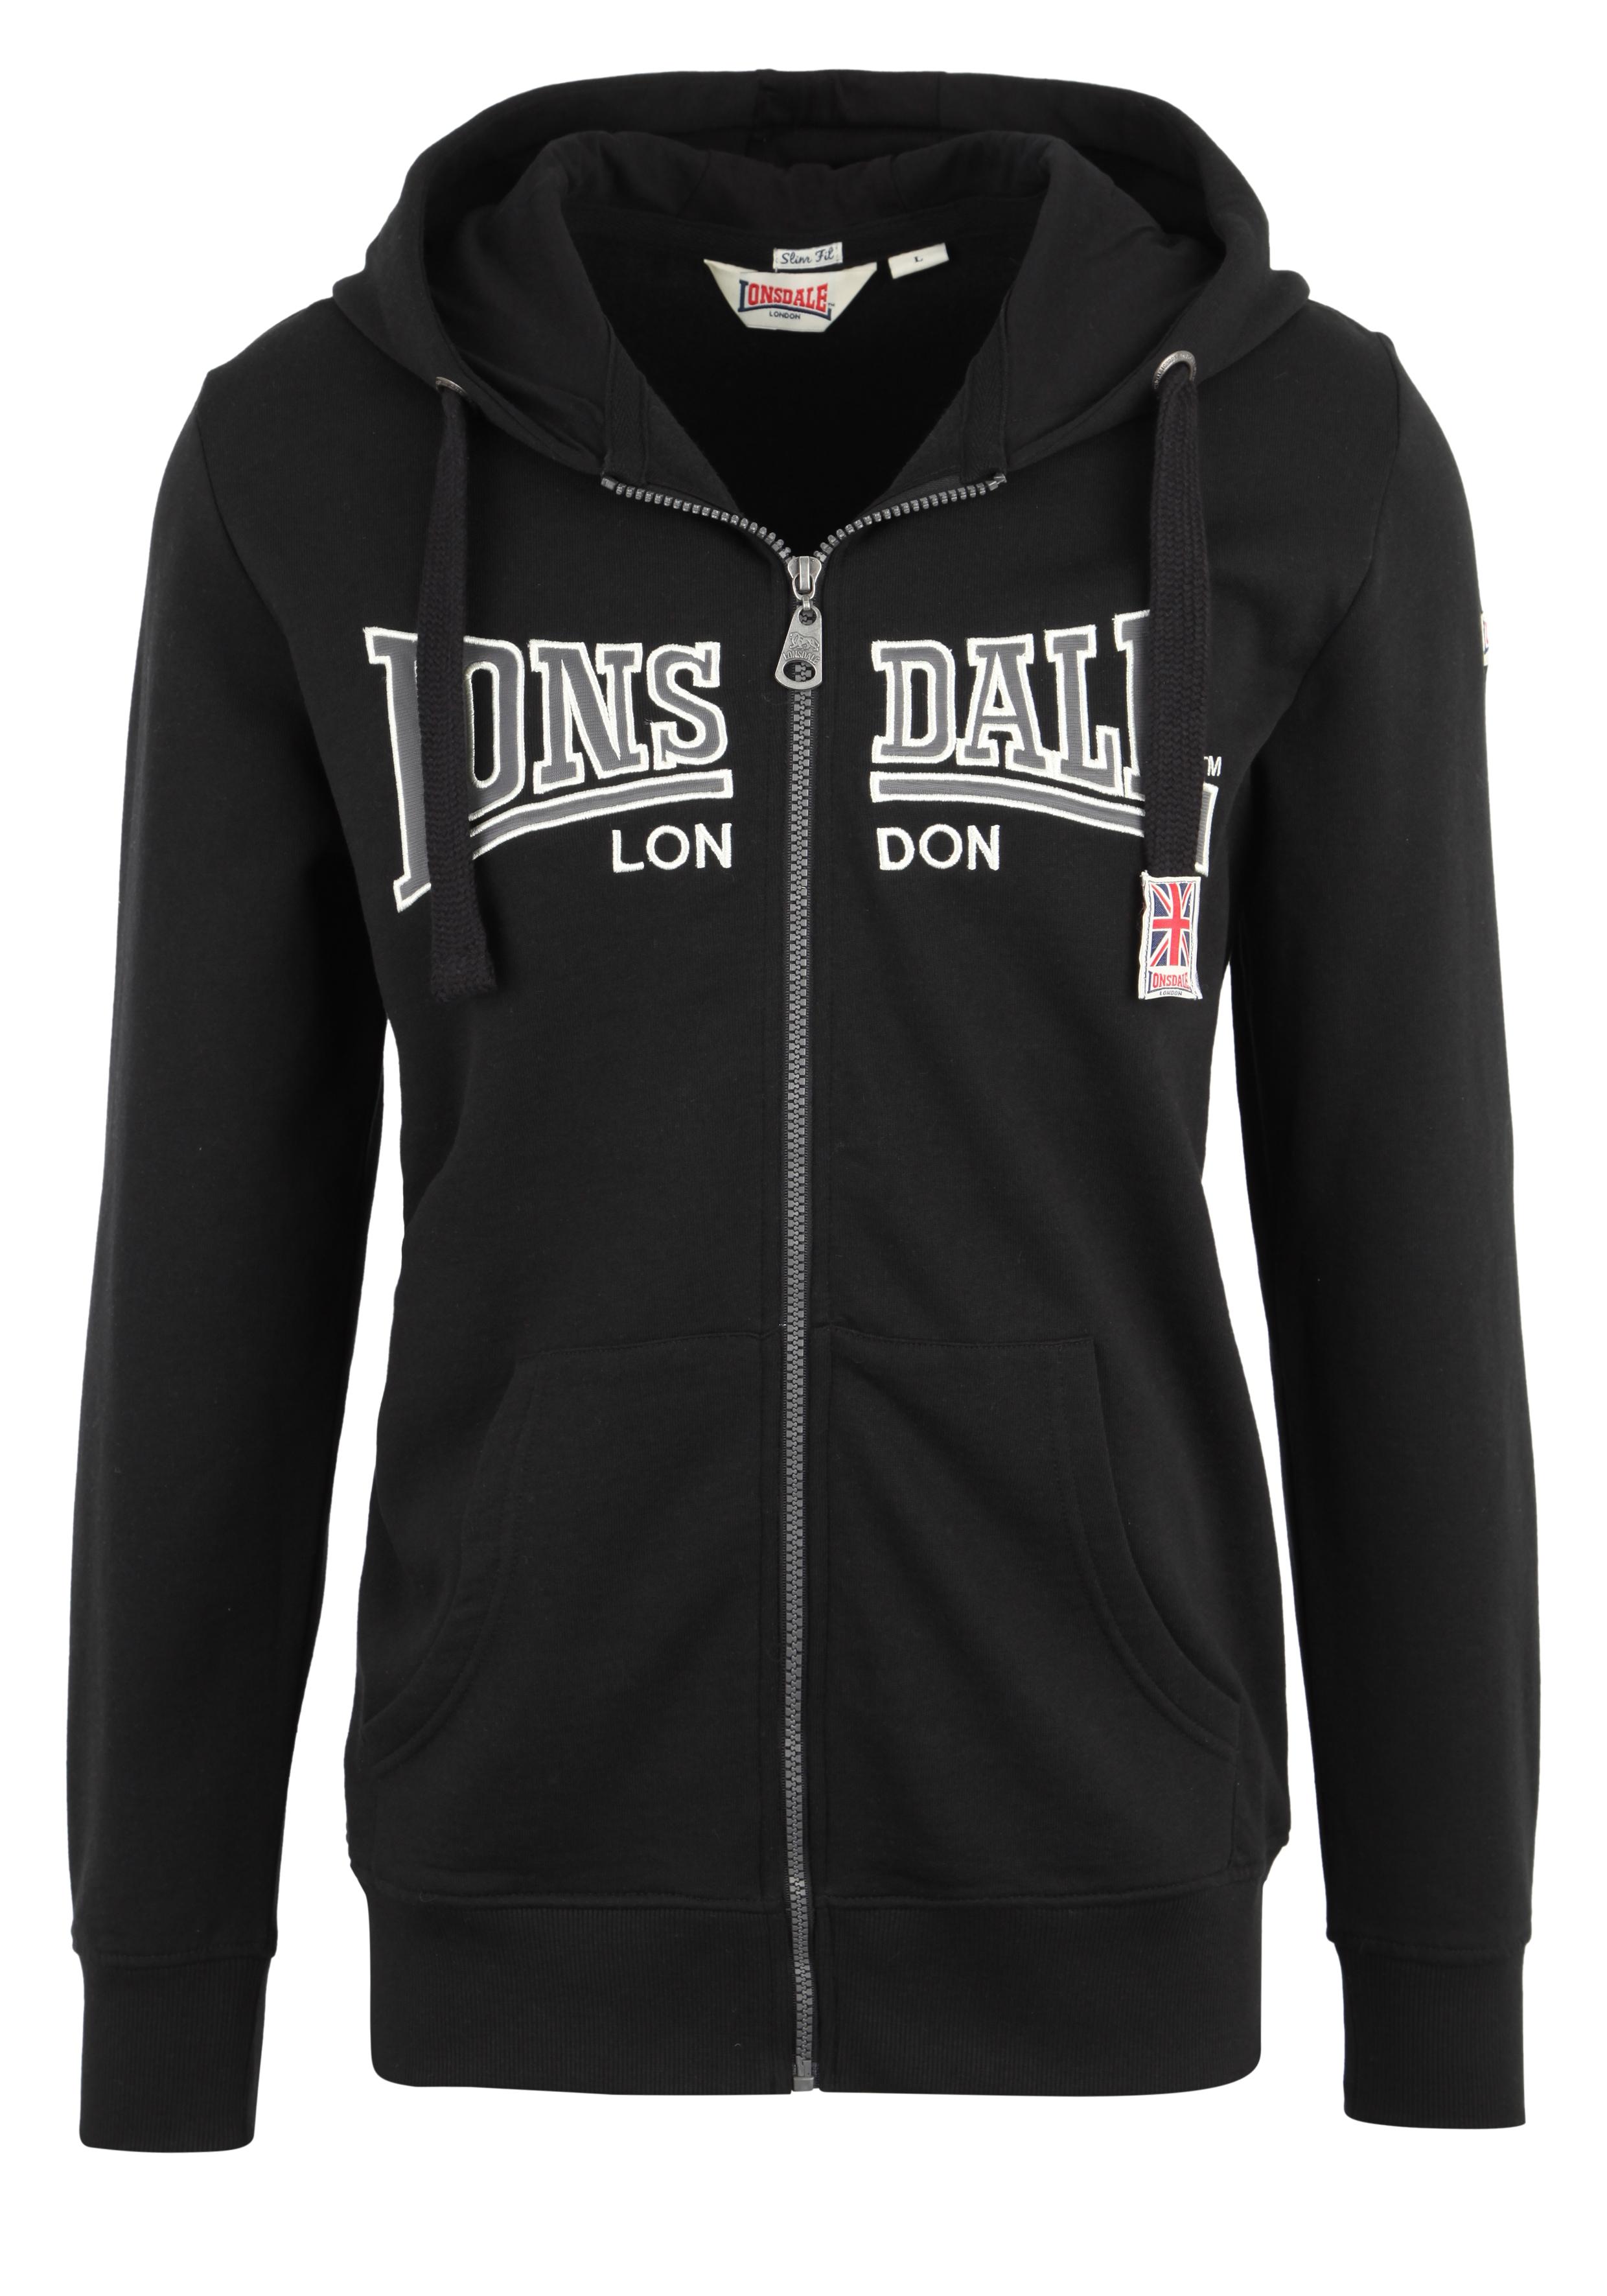 Lonsdale Sweatjacke mit Markendruck ALTHORP | Bekleidung > Sweatshirts & -jacken > Sweatjacken | Lonsdale